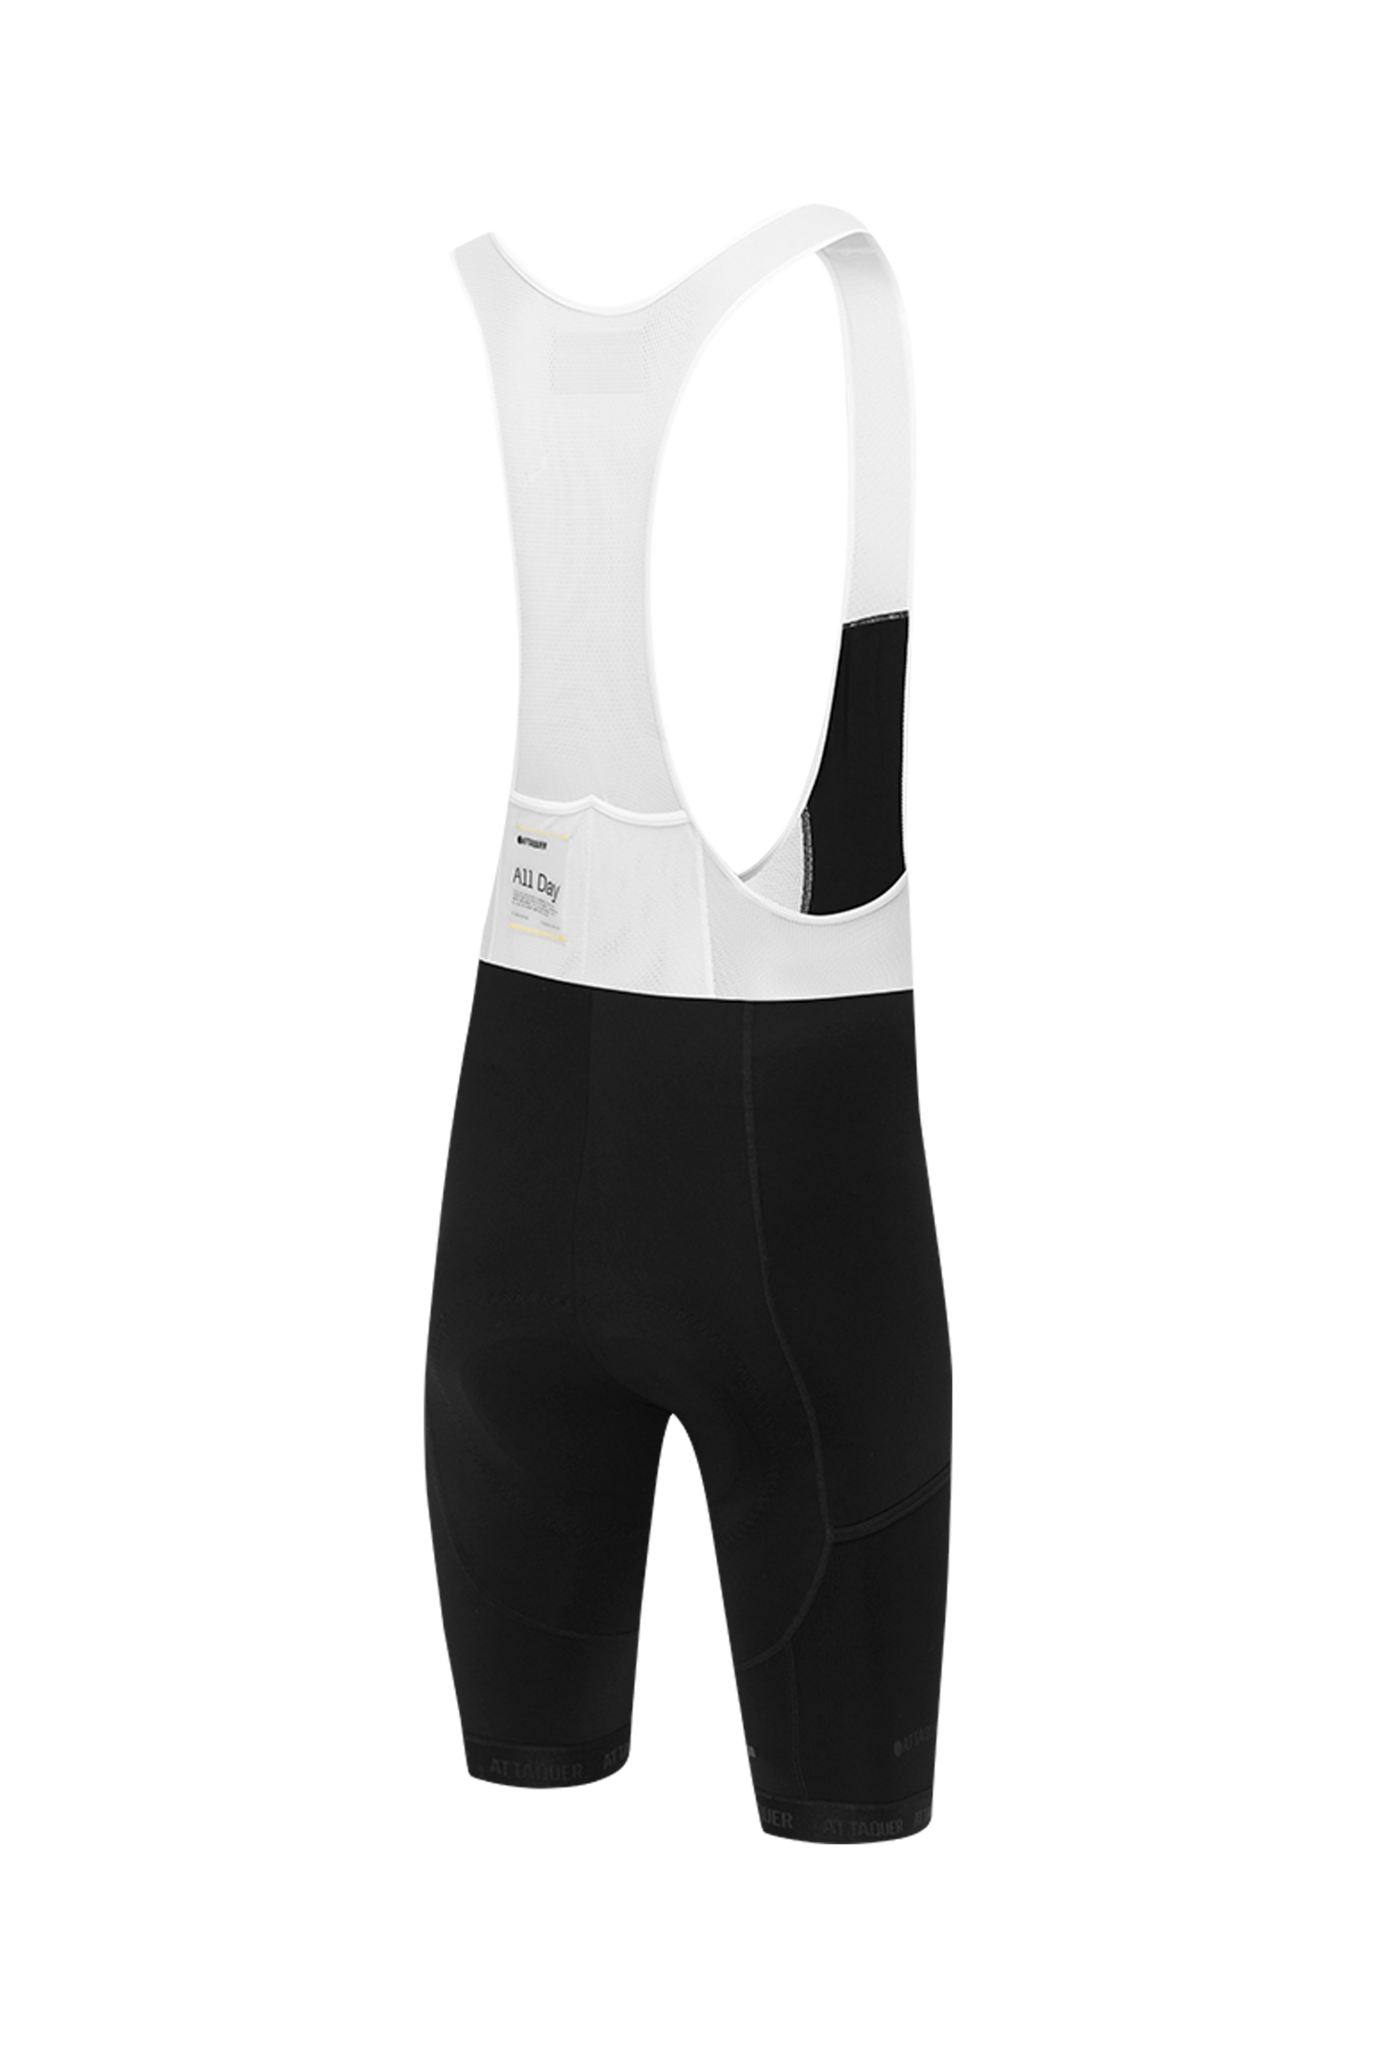 Adventure Bib Short Black Reflective White Logo 2021-2